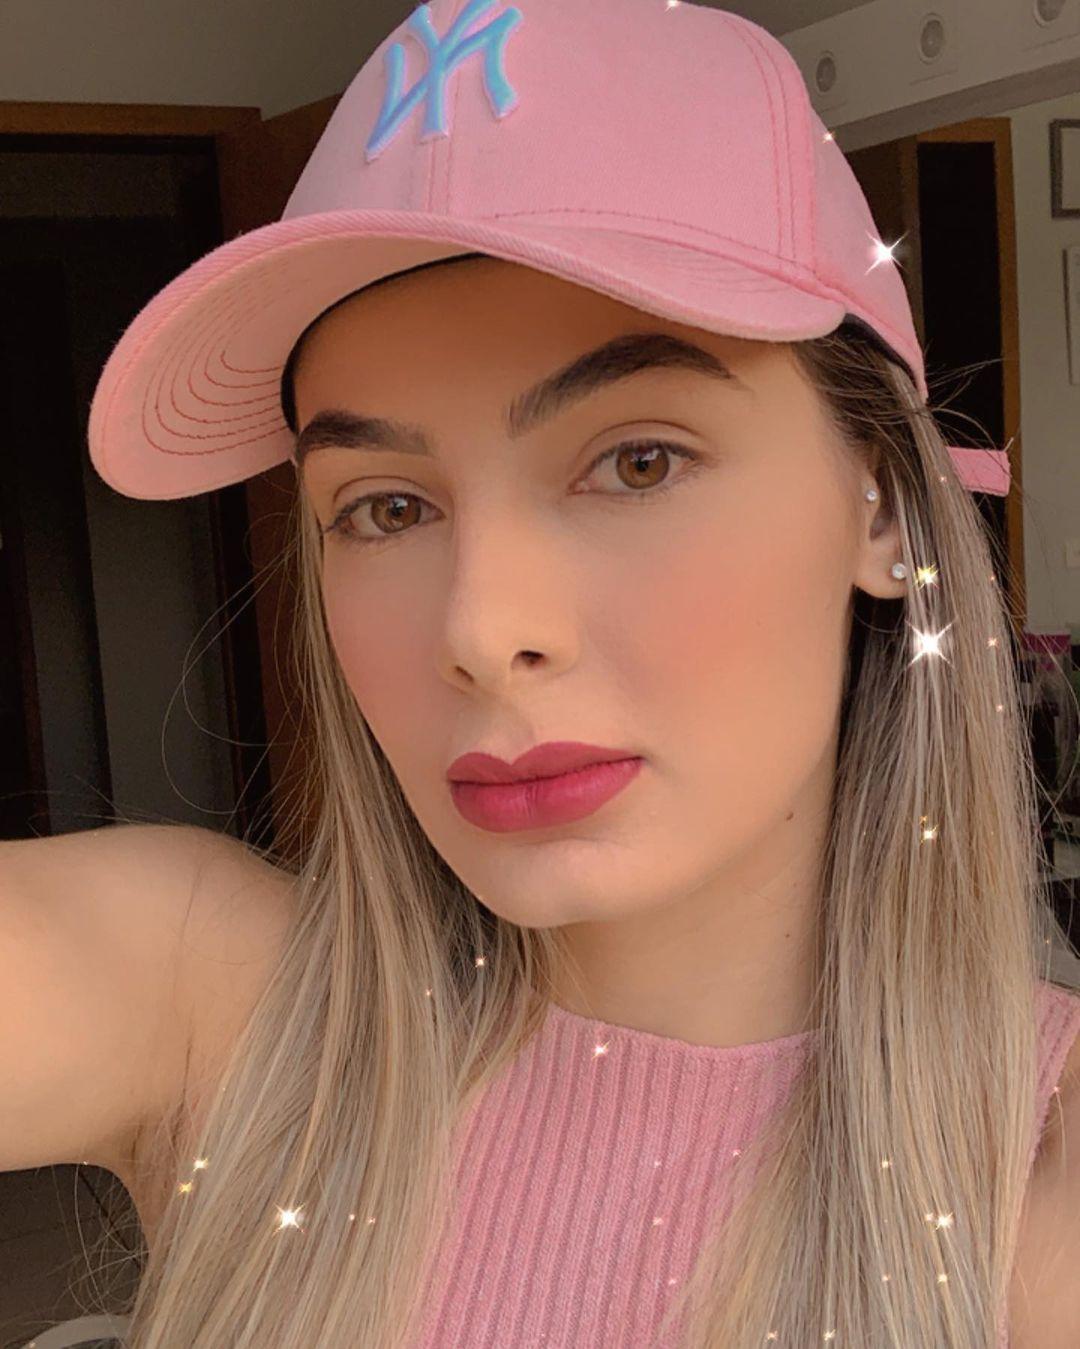 Ana-Jessica-Wallpapers-Insta-Fit-Bio-3